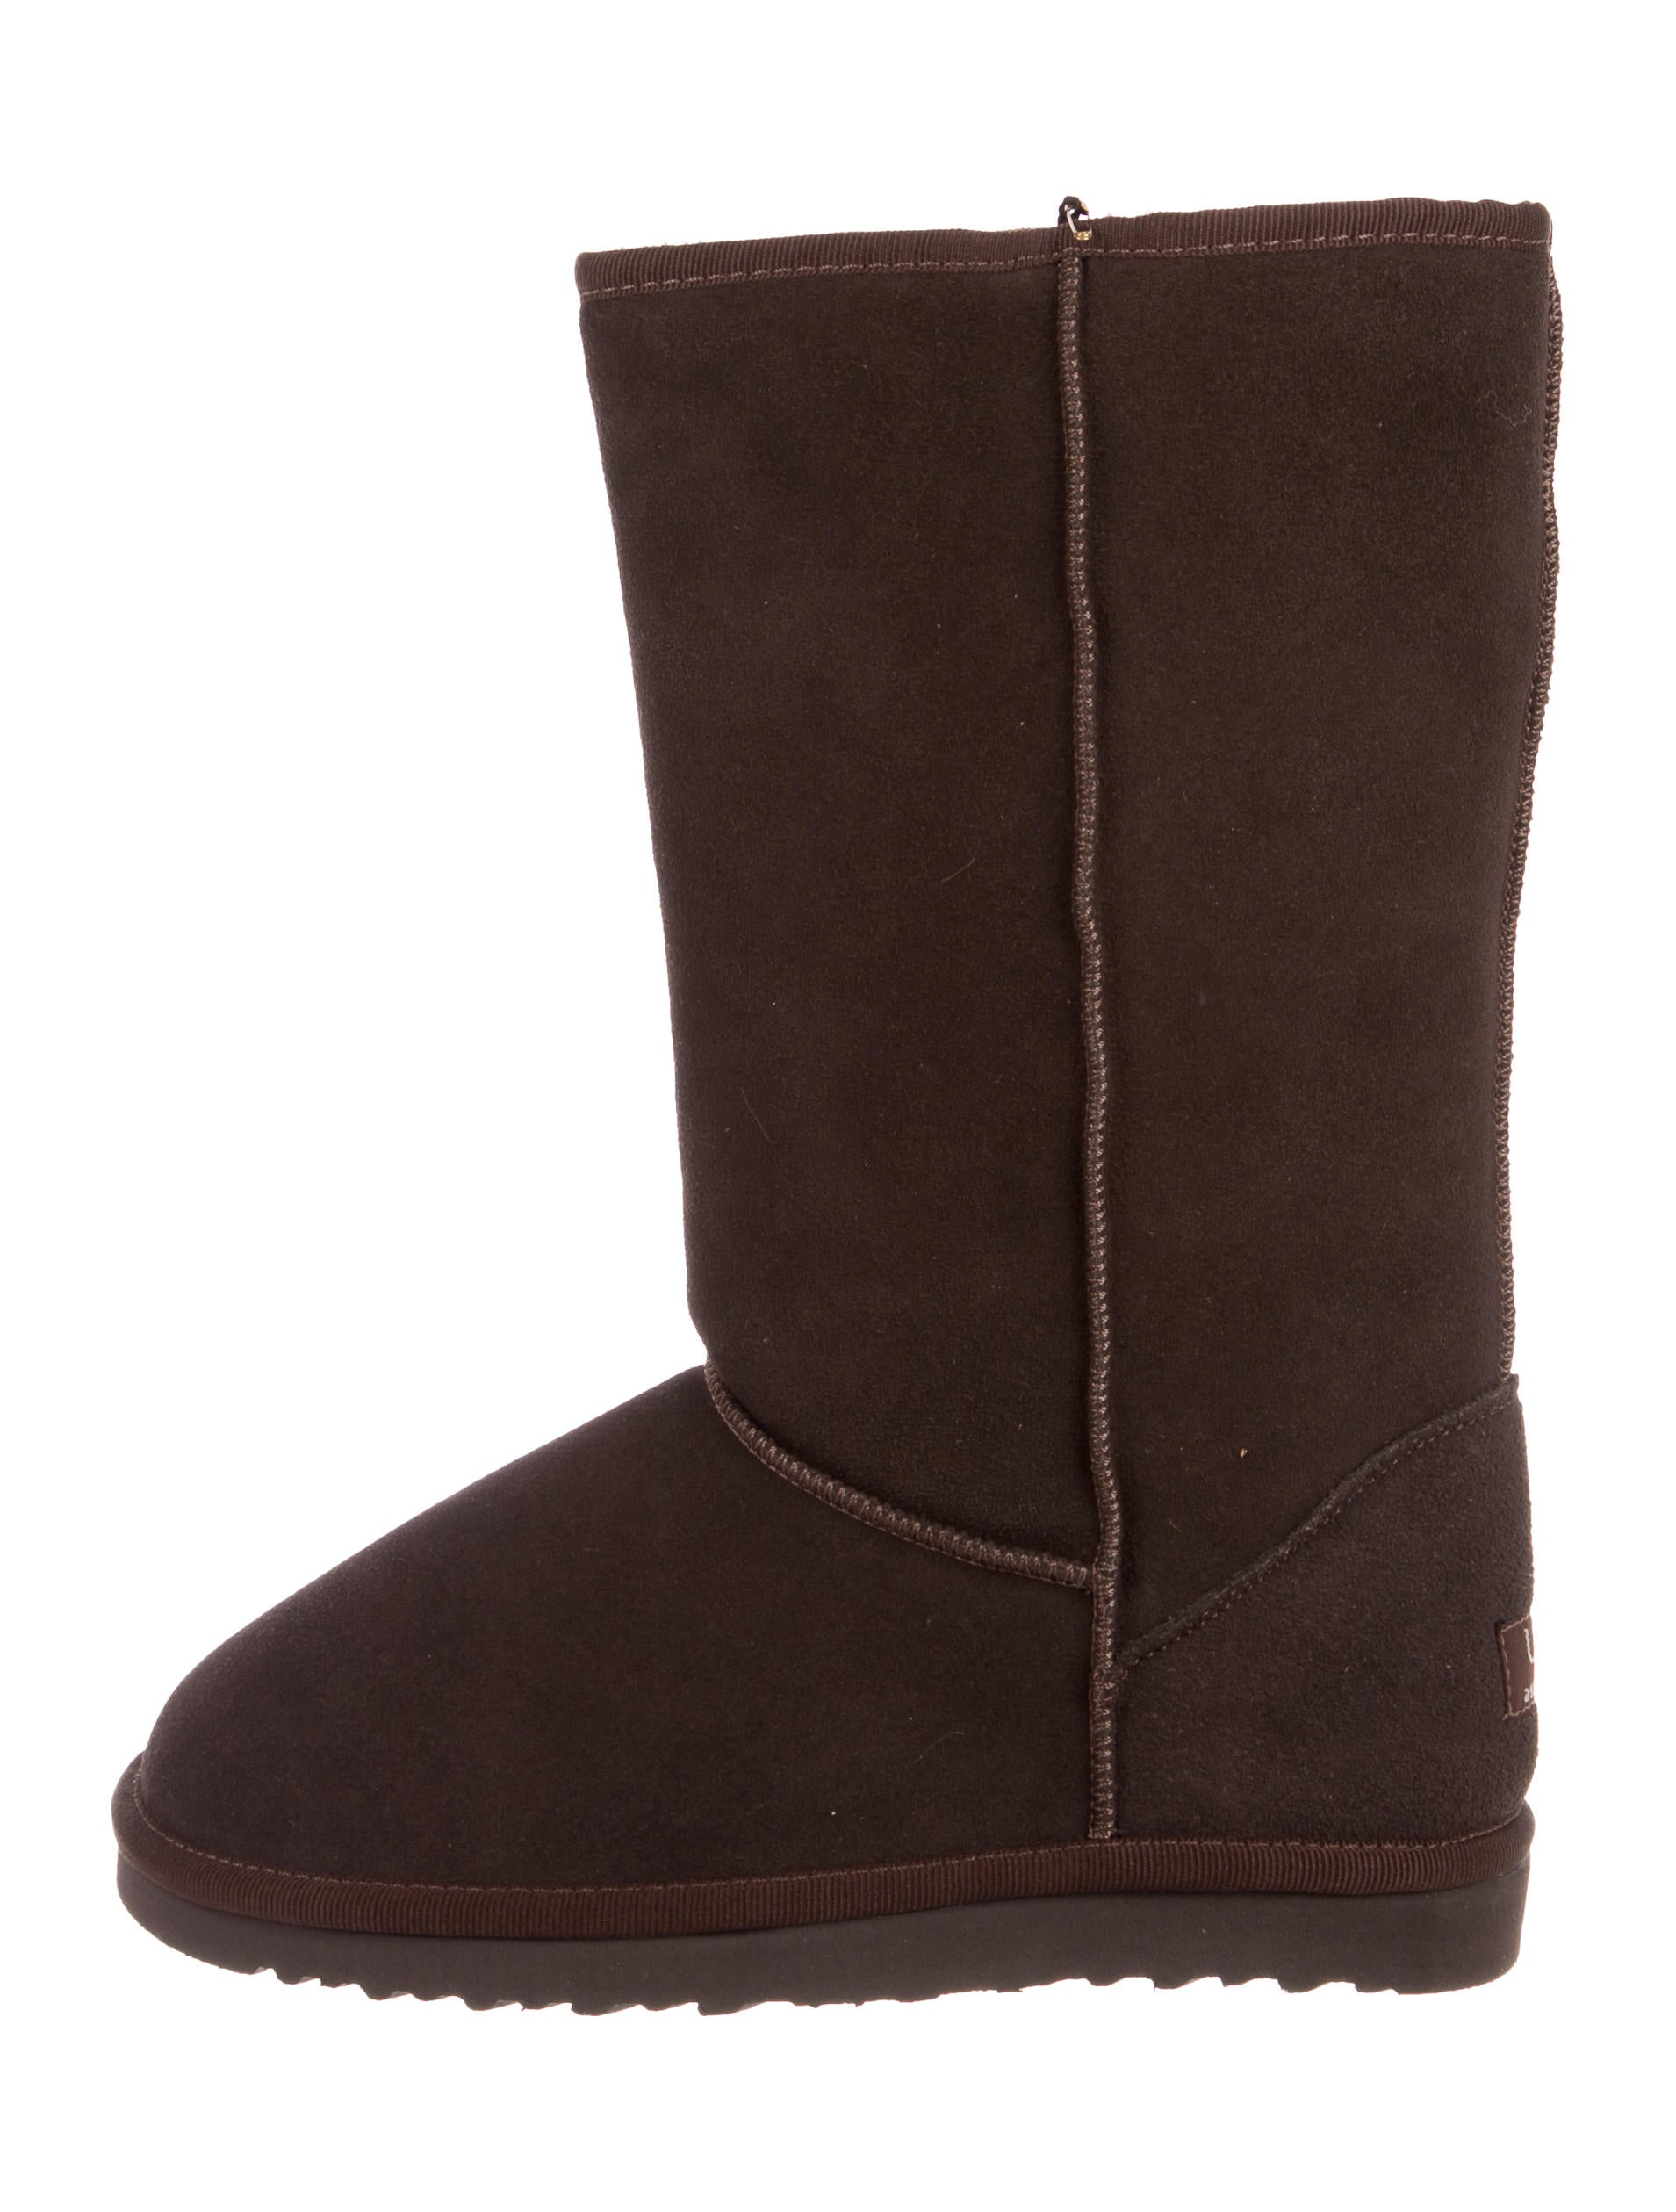 cheap nicekicks UGG Australia Classic Tall Suede Boots w/ Tags latest cheap online for cheap sale online jMDx5Sp